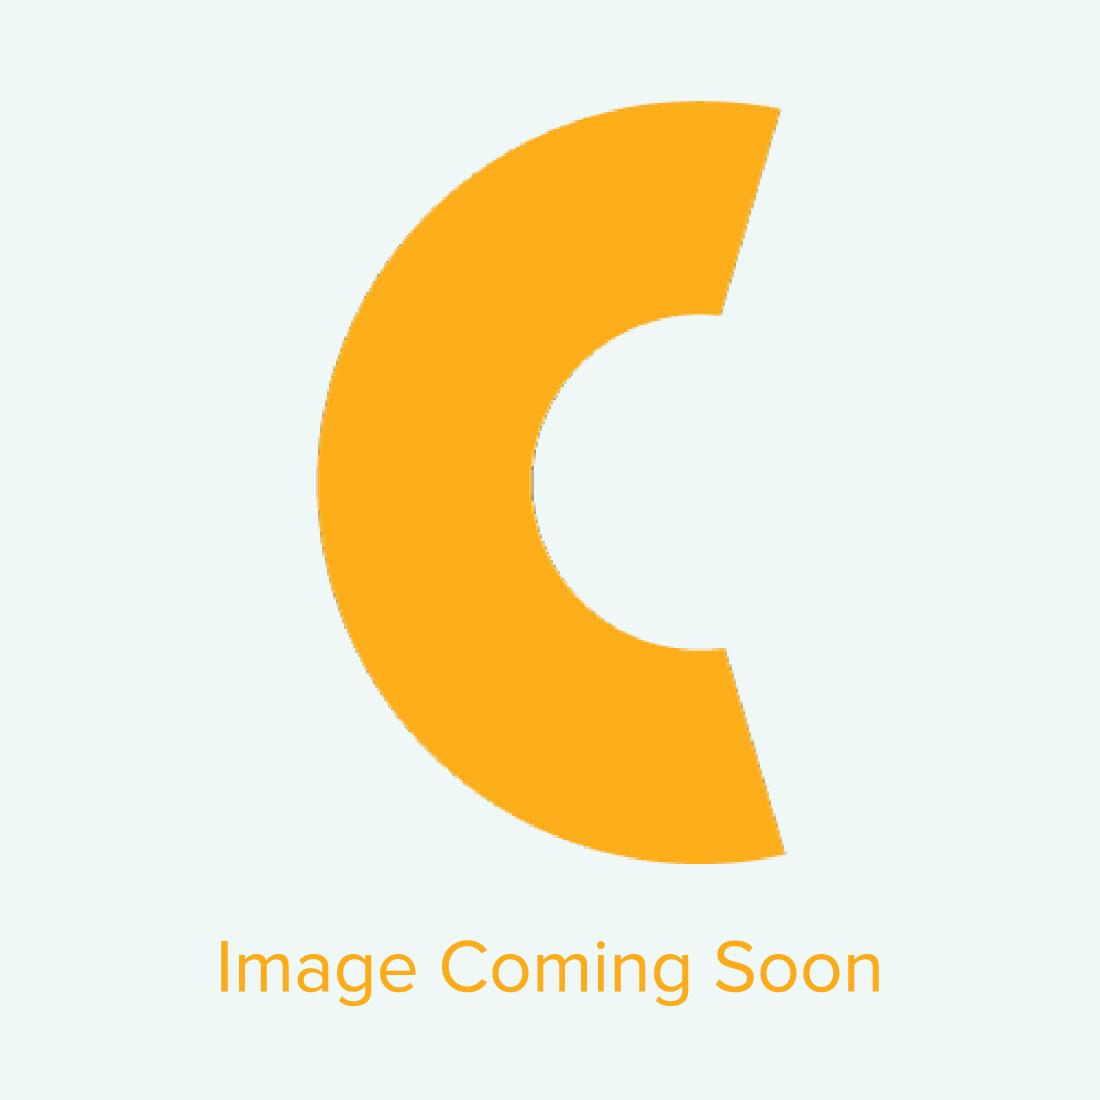 OKI Data C831TS Replacement Transfer Belt